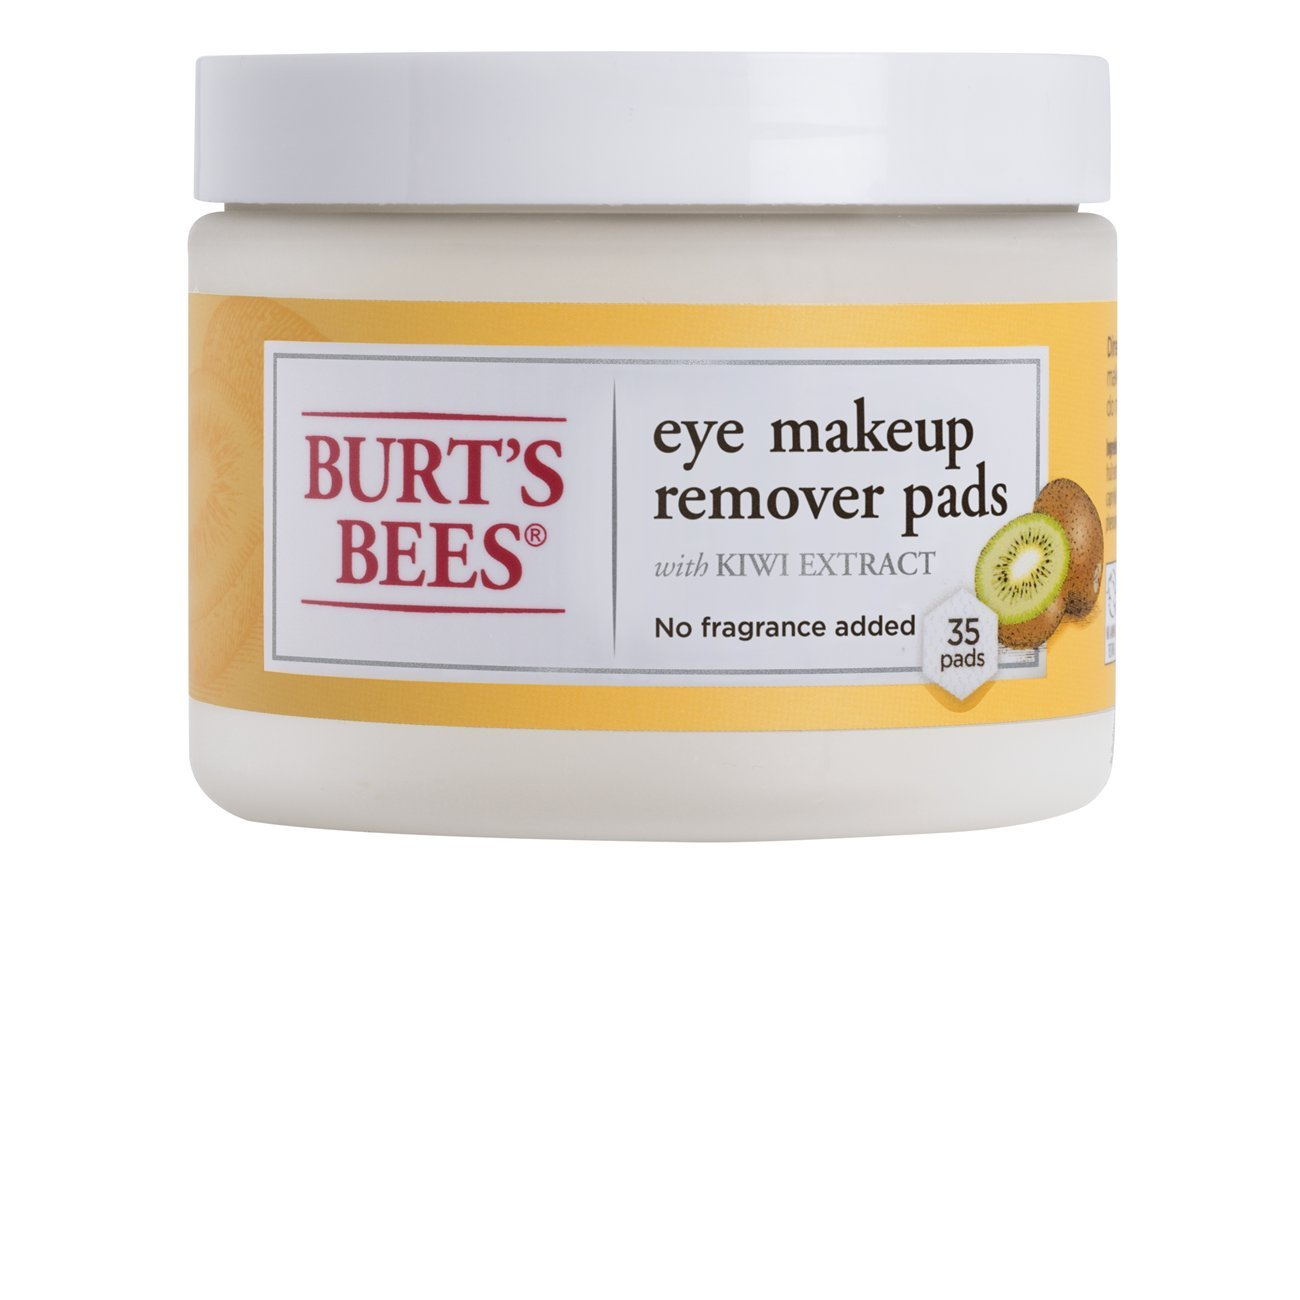 Burt's Bees Eye Makeup Remover Pads, 35 Count Burt's Bees Inc.